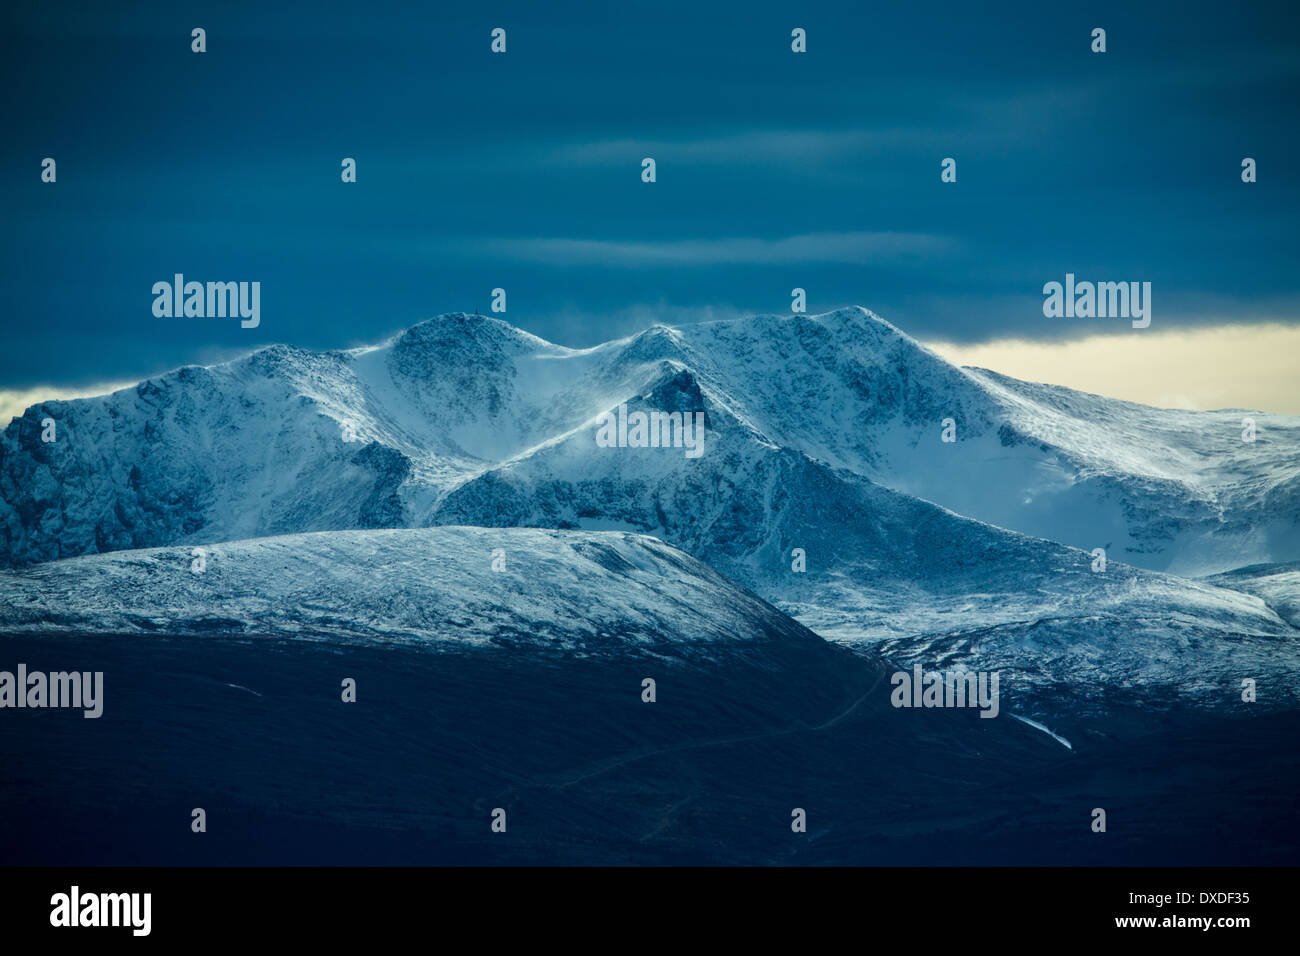 Montana Mountain, nr Carcross, Yukon Territories, Canada - Stock Image